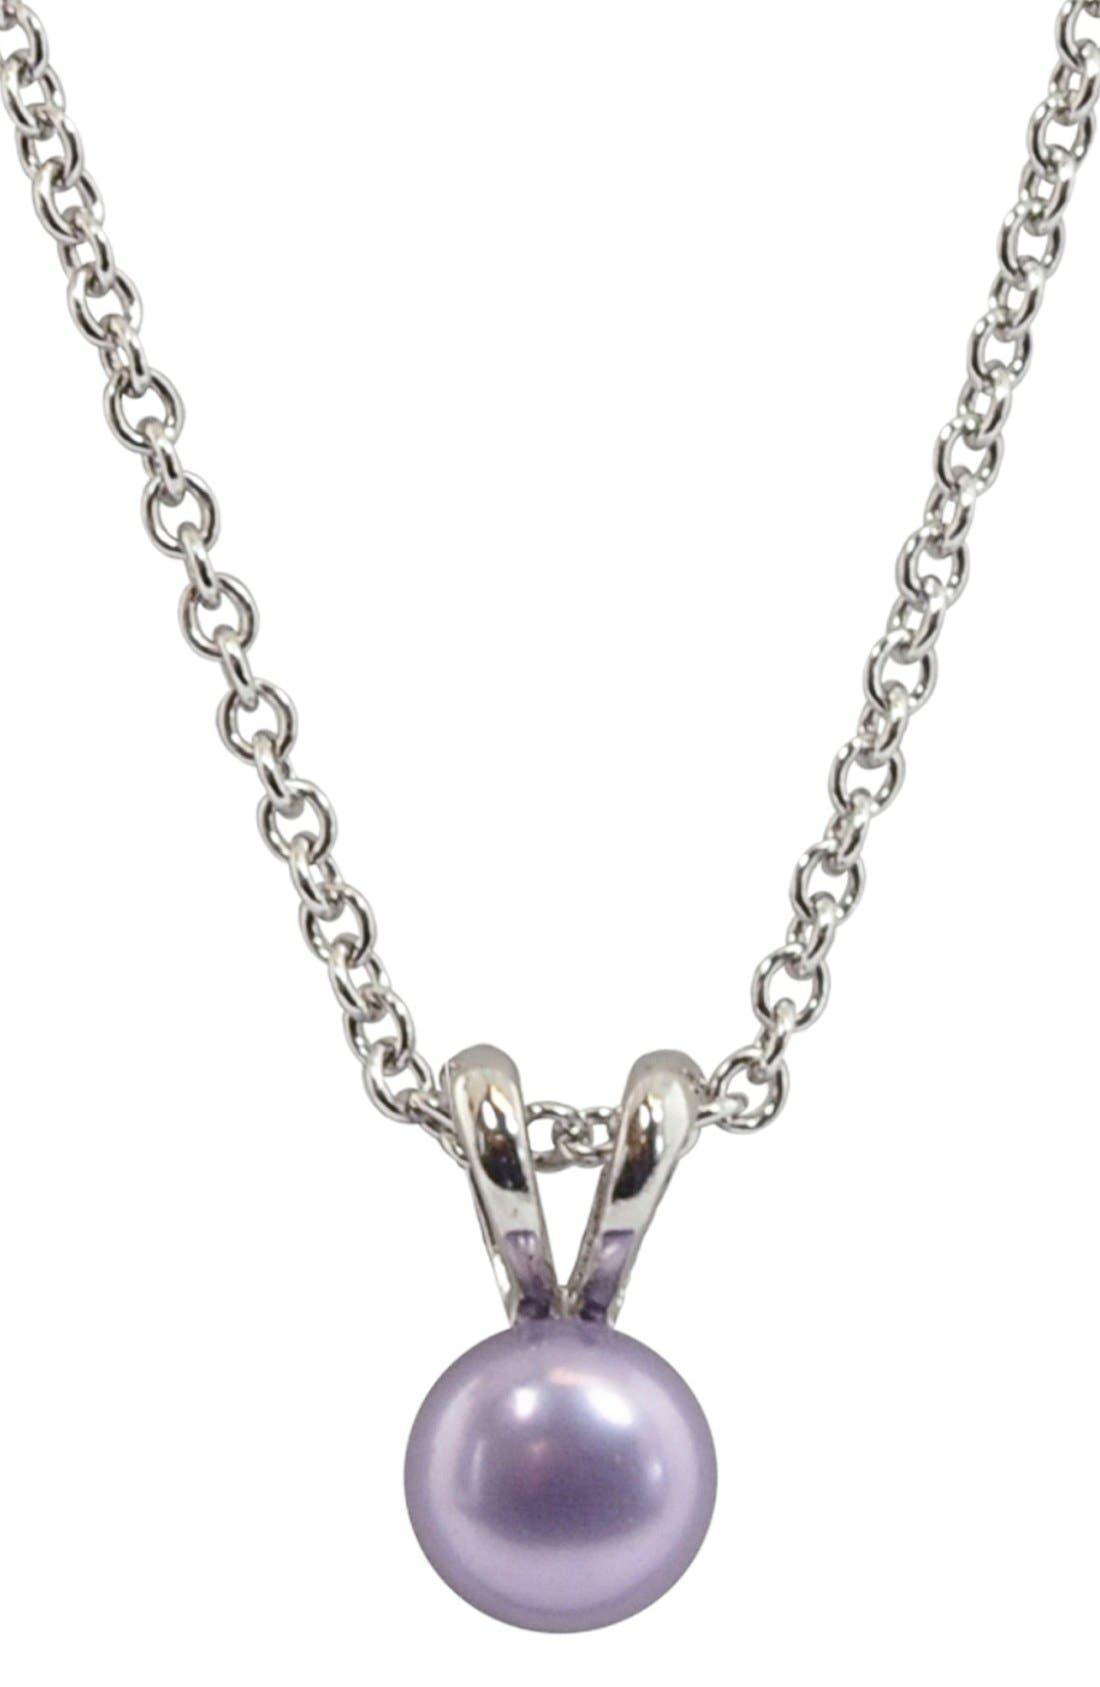 Violet Freshwater Pearl Necklace,                             Main thumbnail 1, color,                             VIOLET